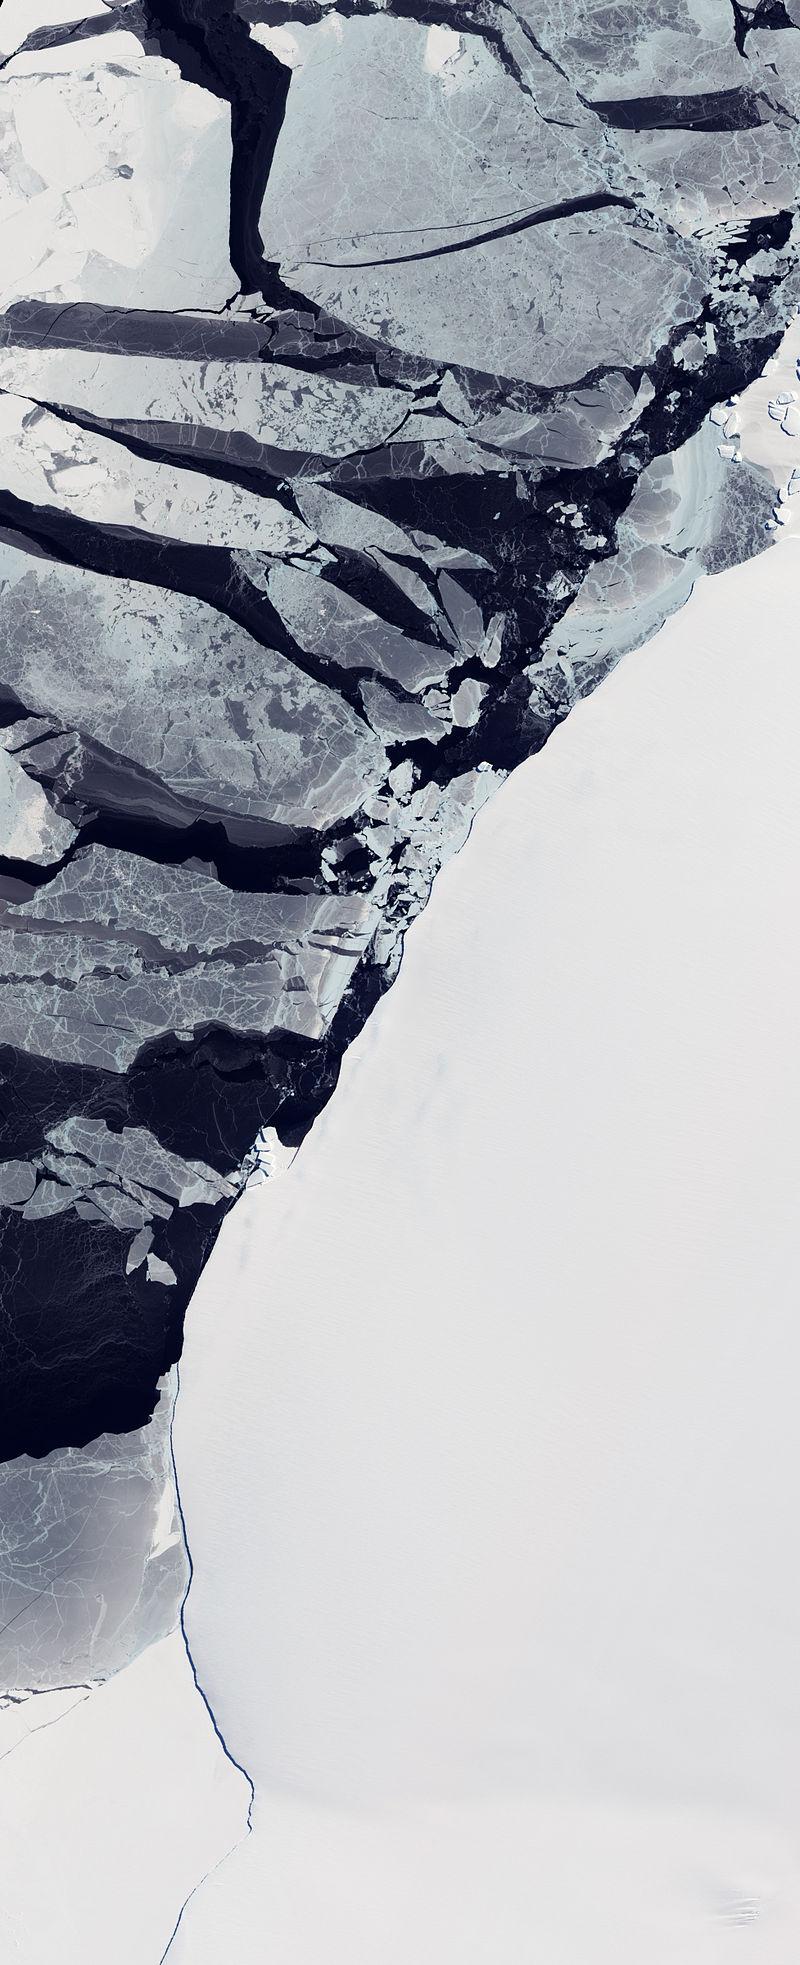 Sea Ice and Icebergs off East Antarctica.jpg